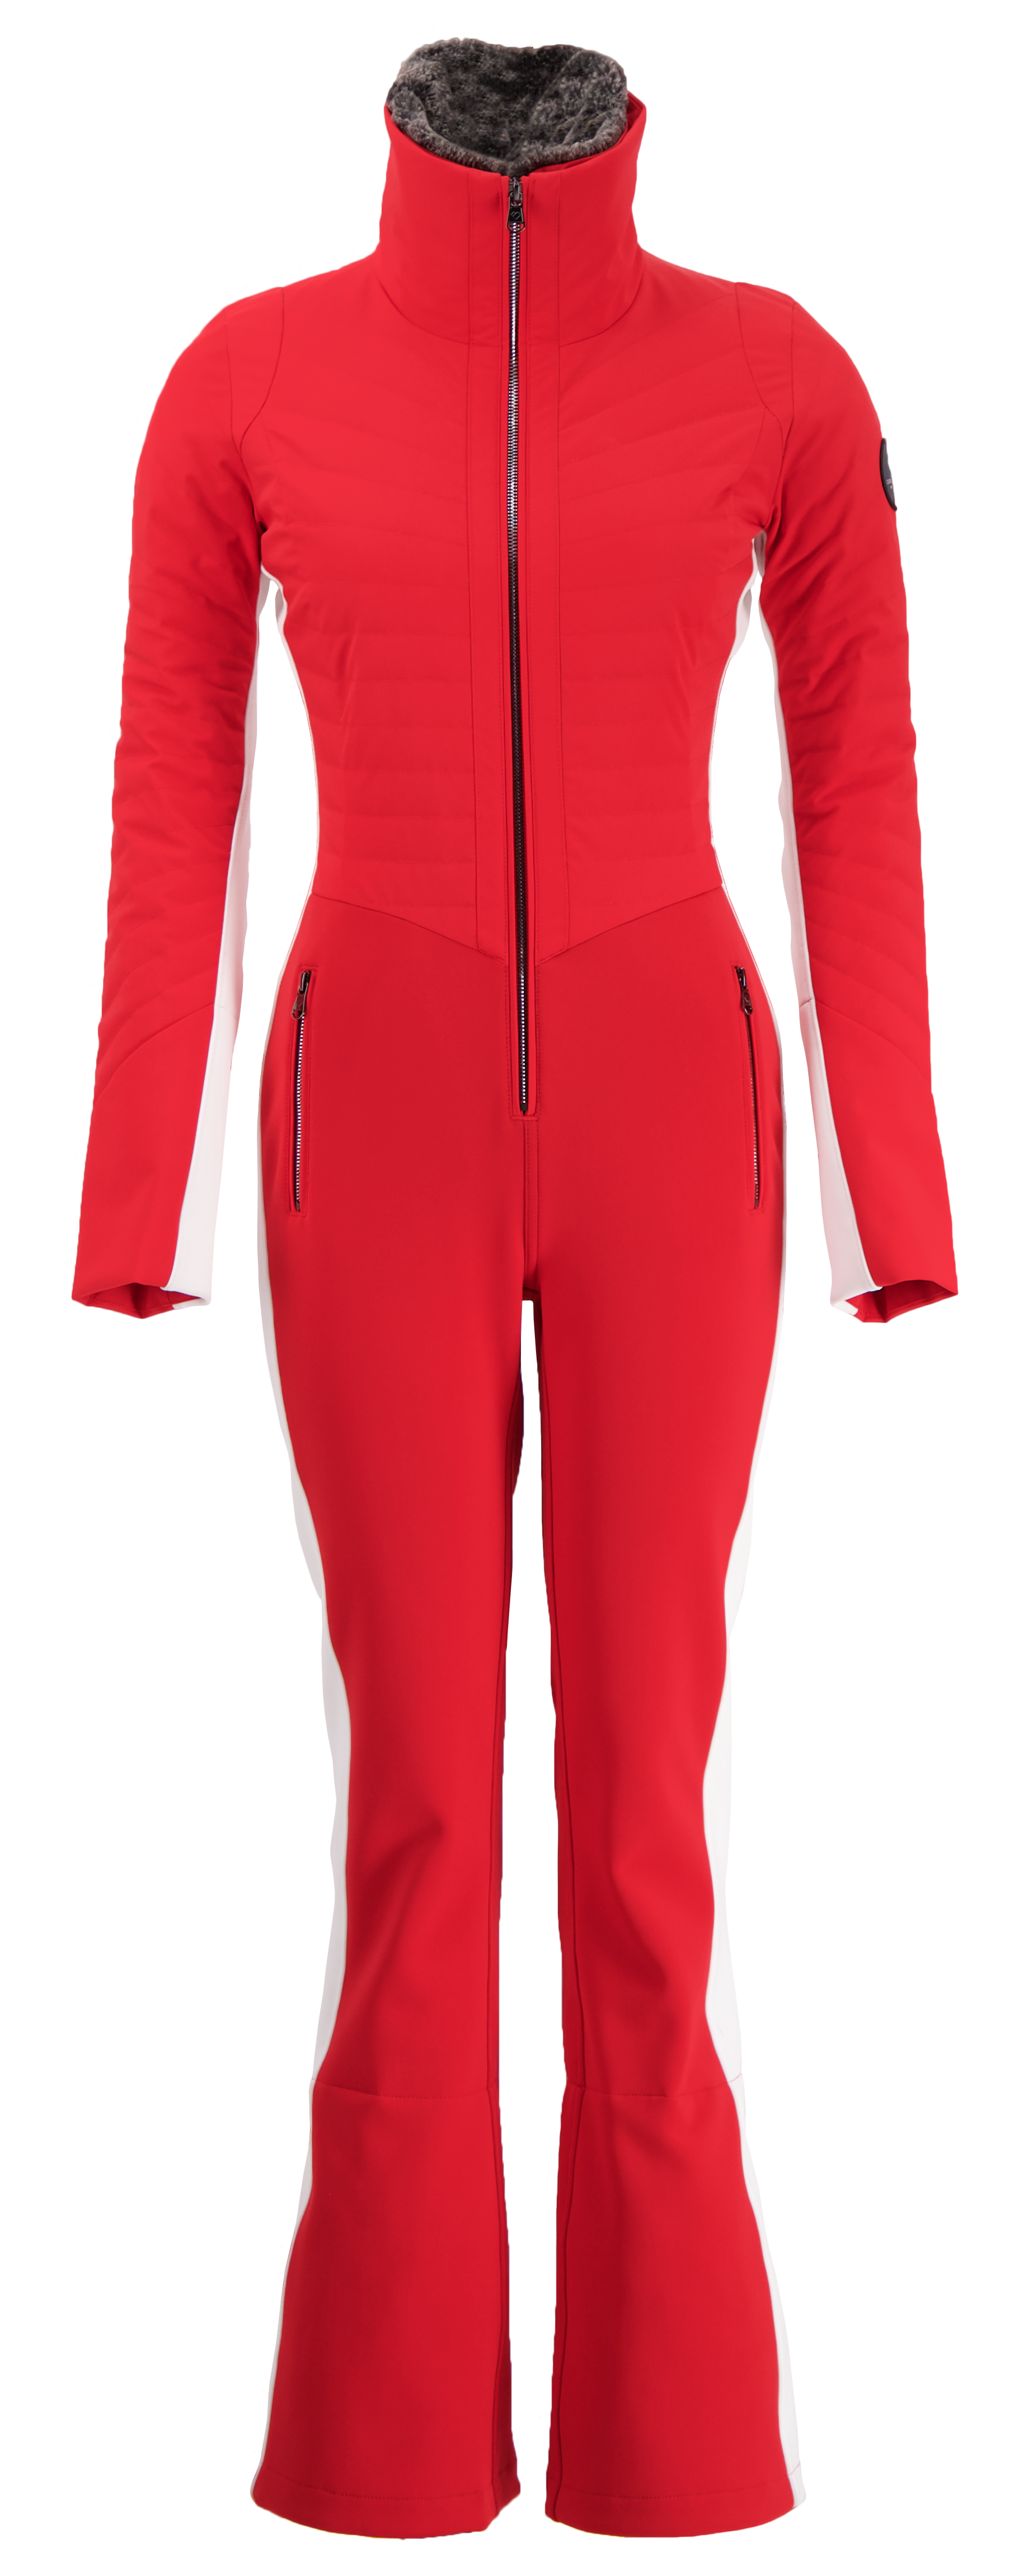 152 Salomon Q 83 Myriad Women's Skis 201516 | Utah Ski Gear